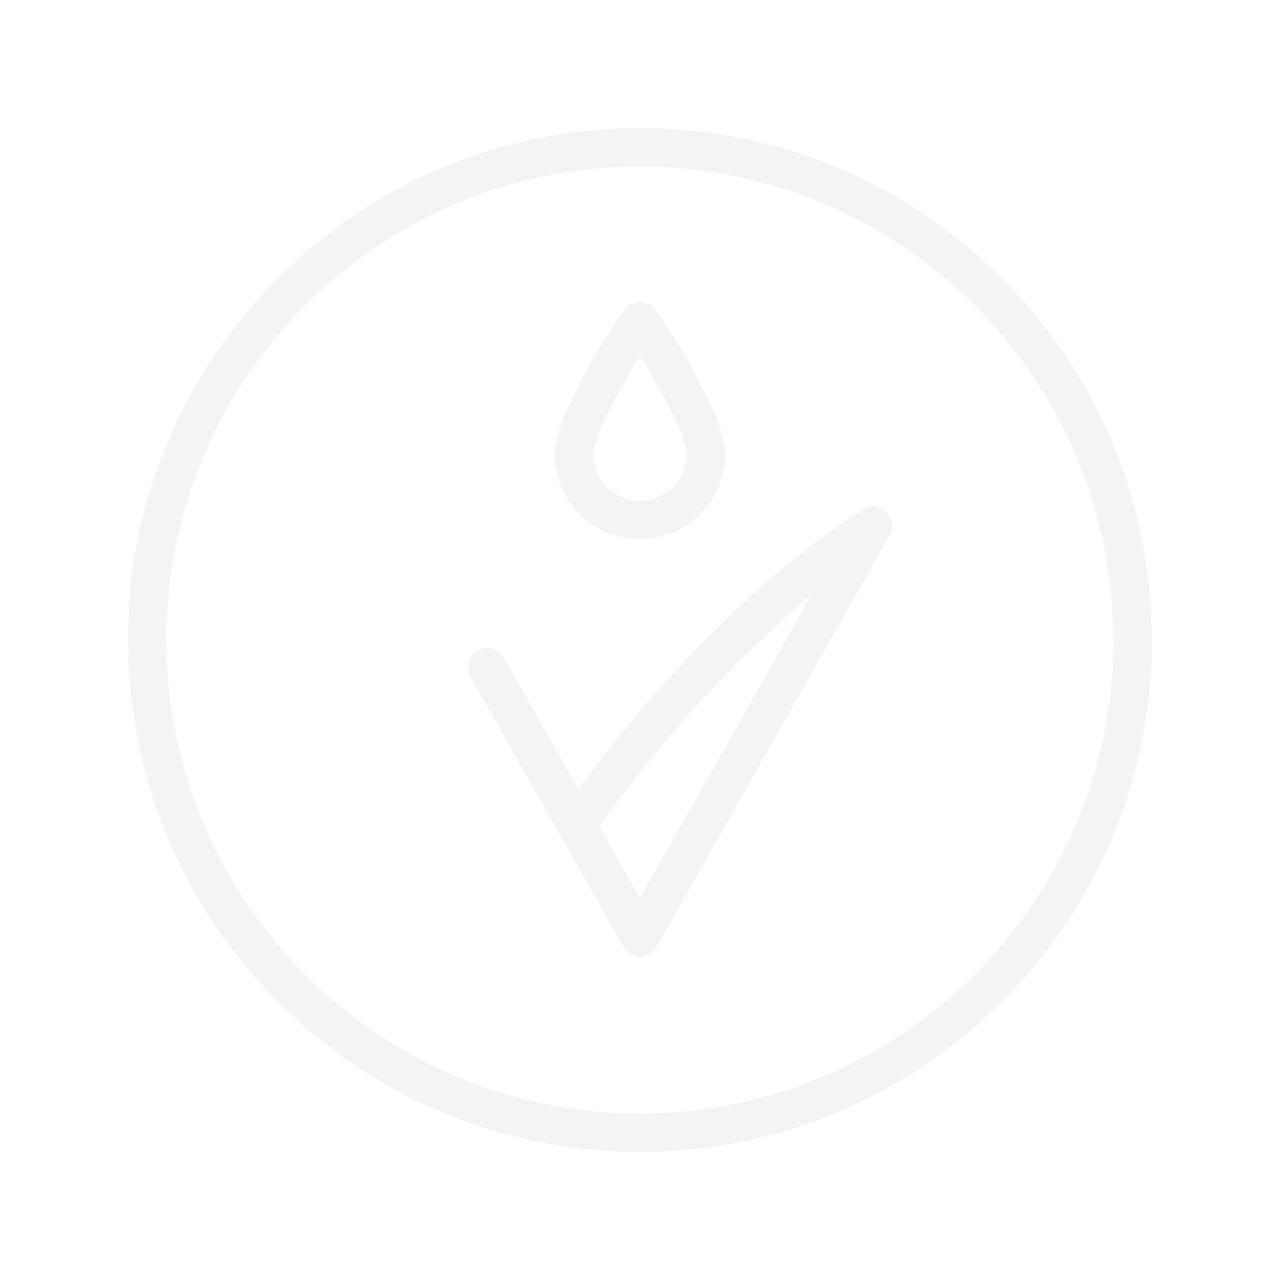 MARLIES MÖLLER Pashmisilk Luxury Silky Hair Bath 200ml